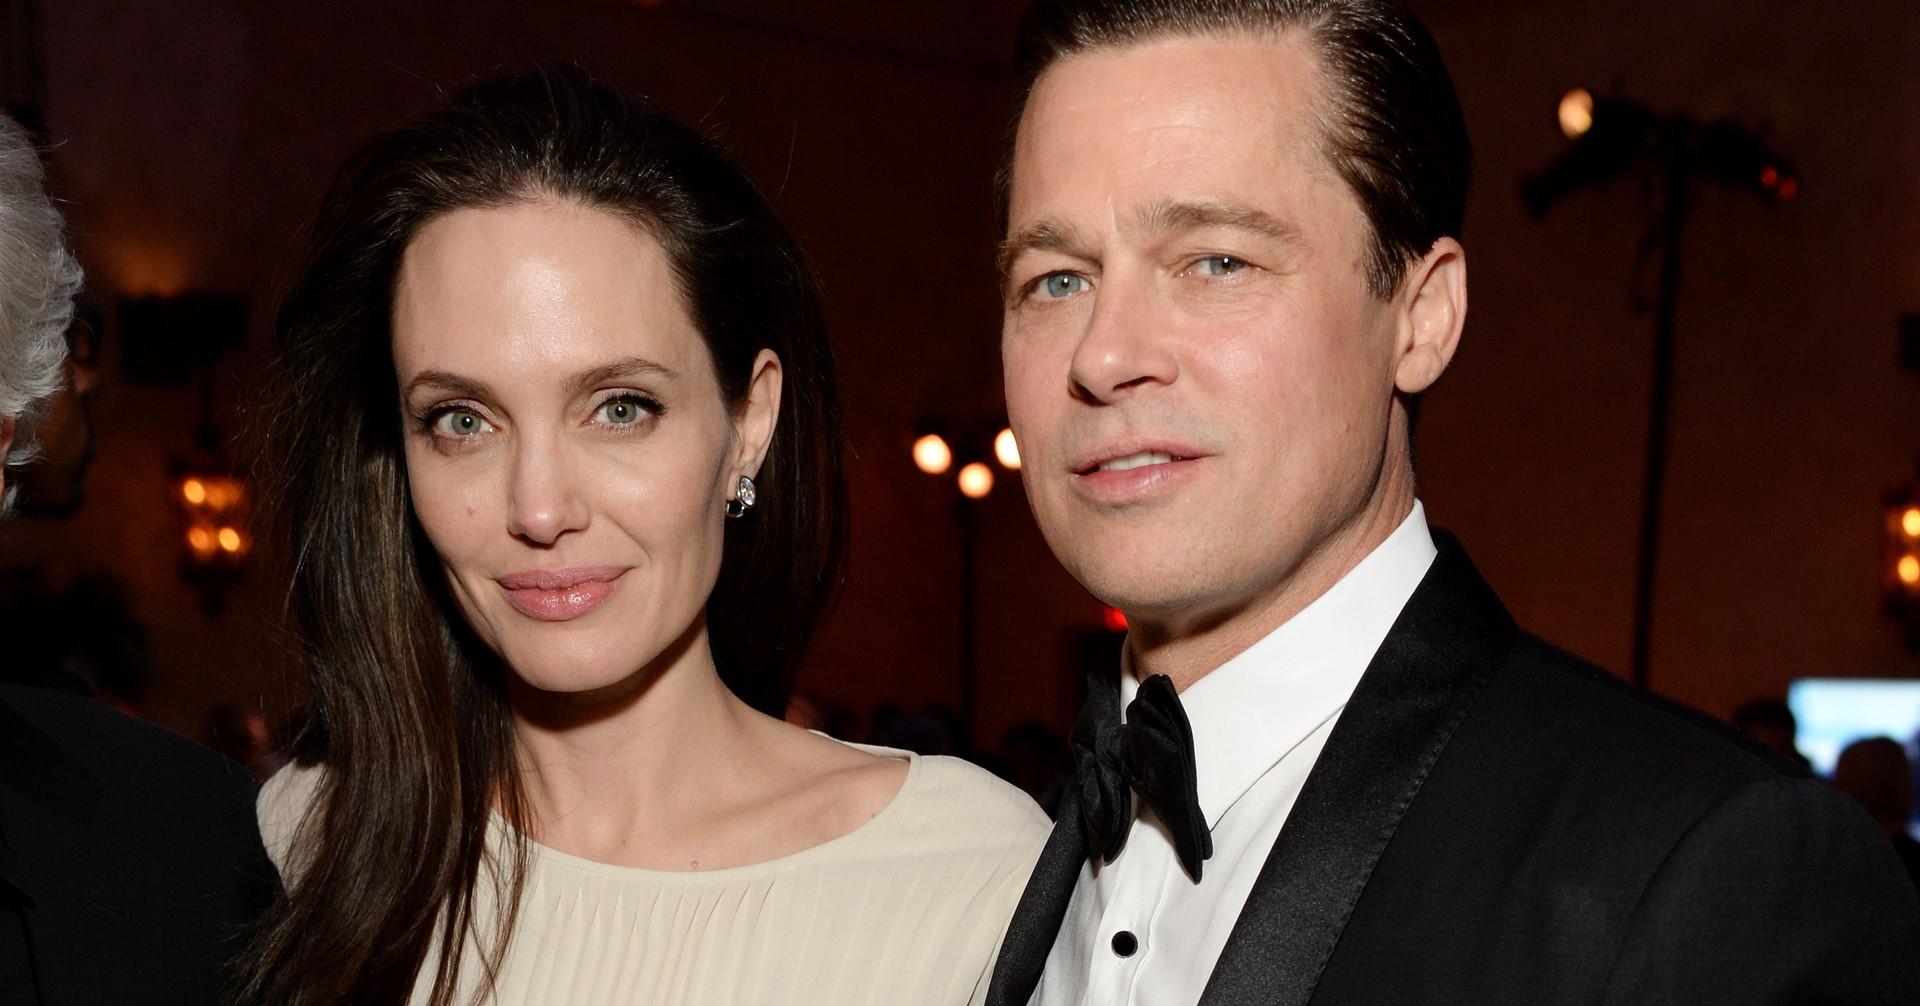 Brad Pitt and Angelina Jolie براد بيت وانجلينا جولي